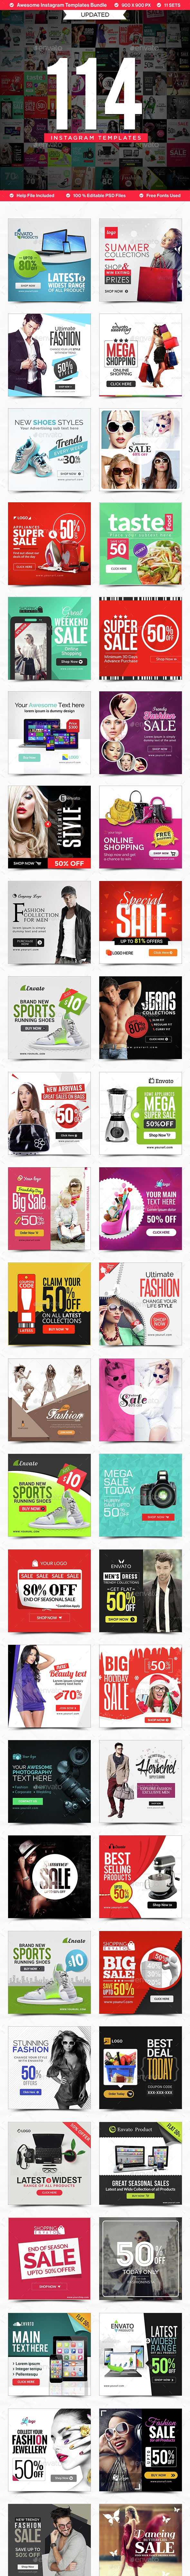 Instagram Templates Bundle - 114 Designs - UPDATED! - Social Media Web Elements